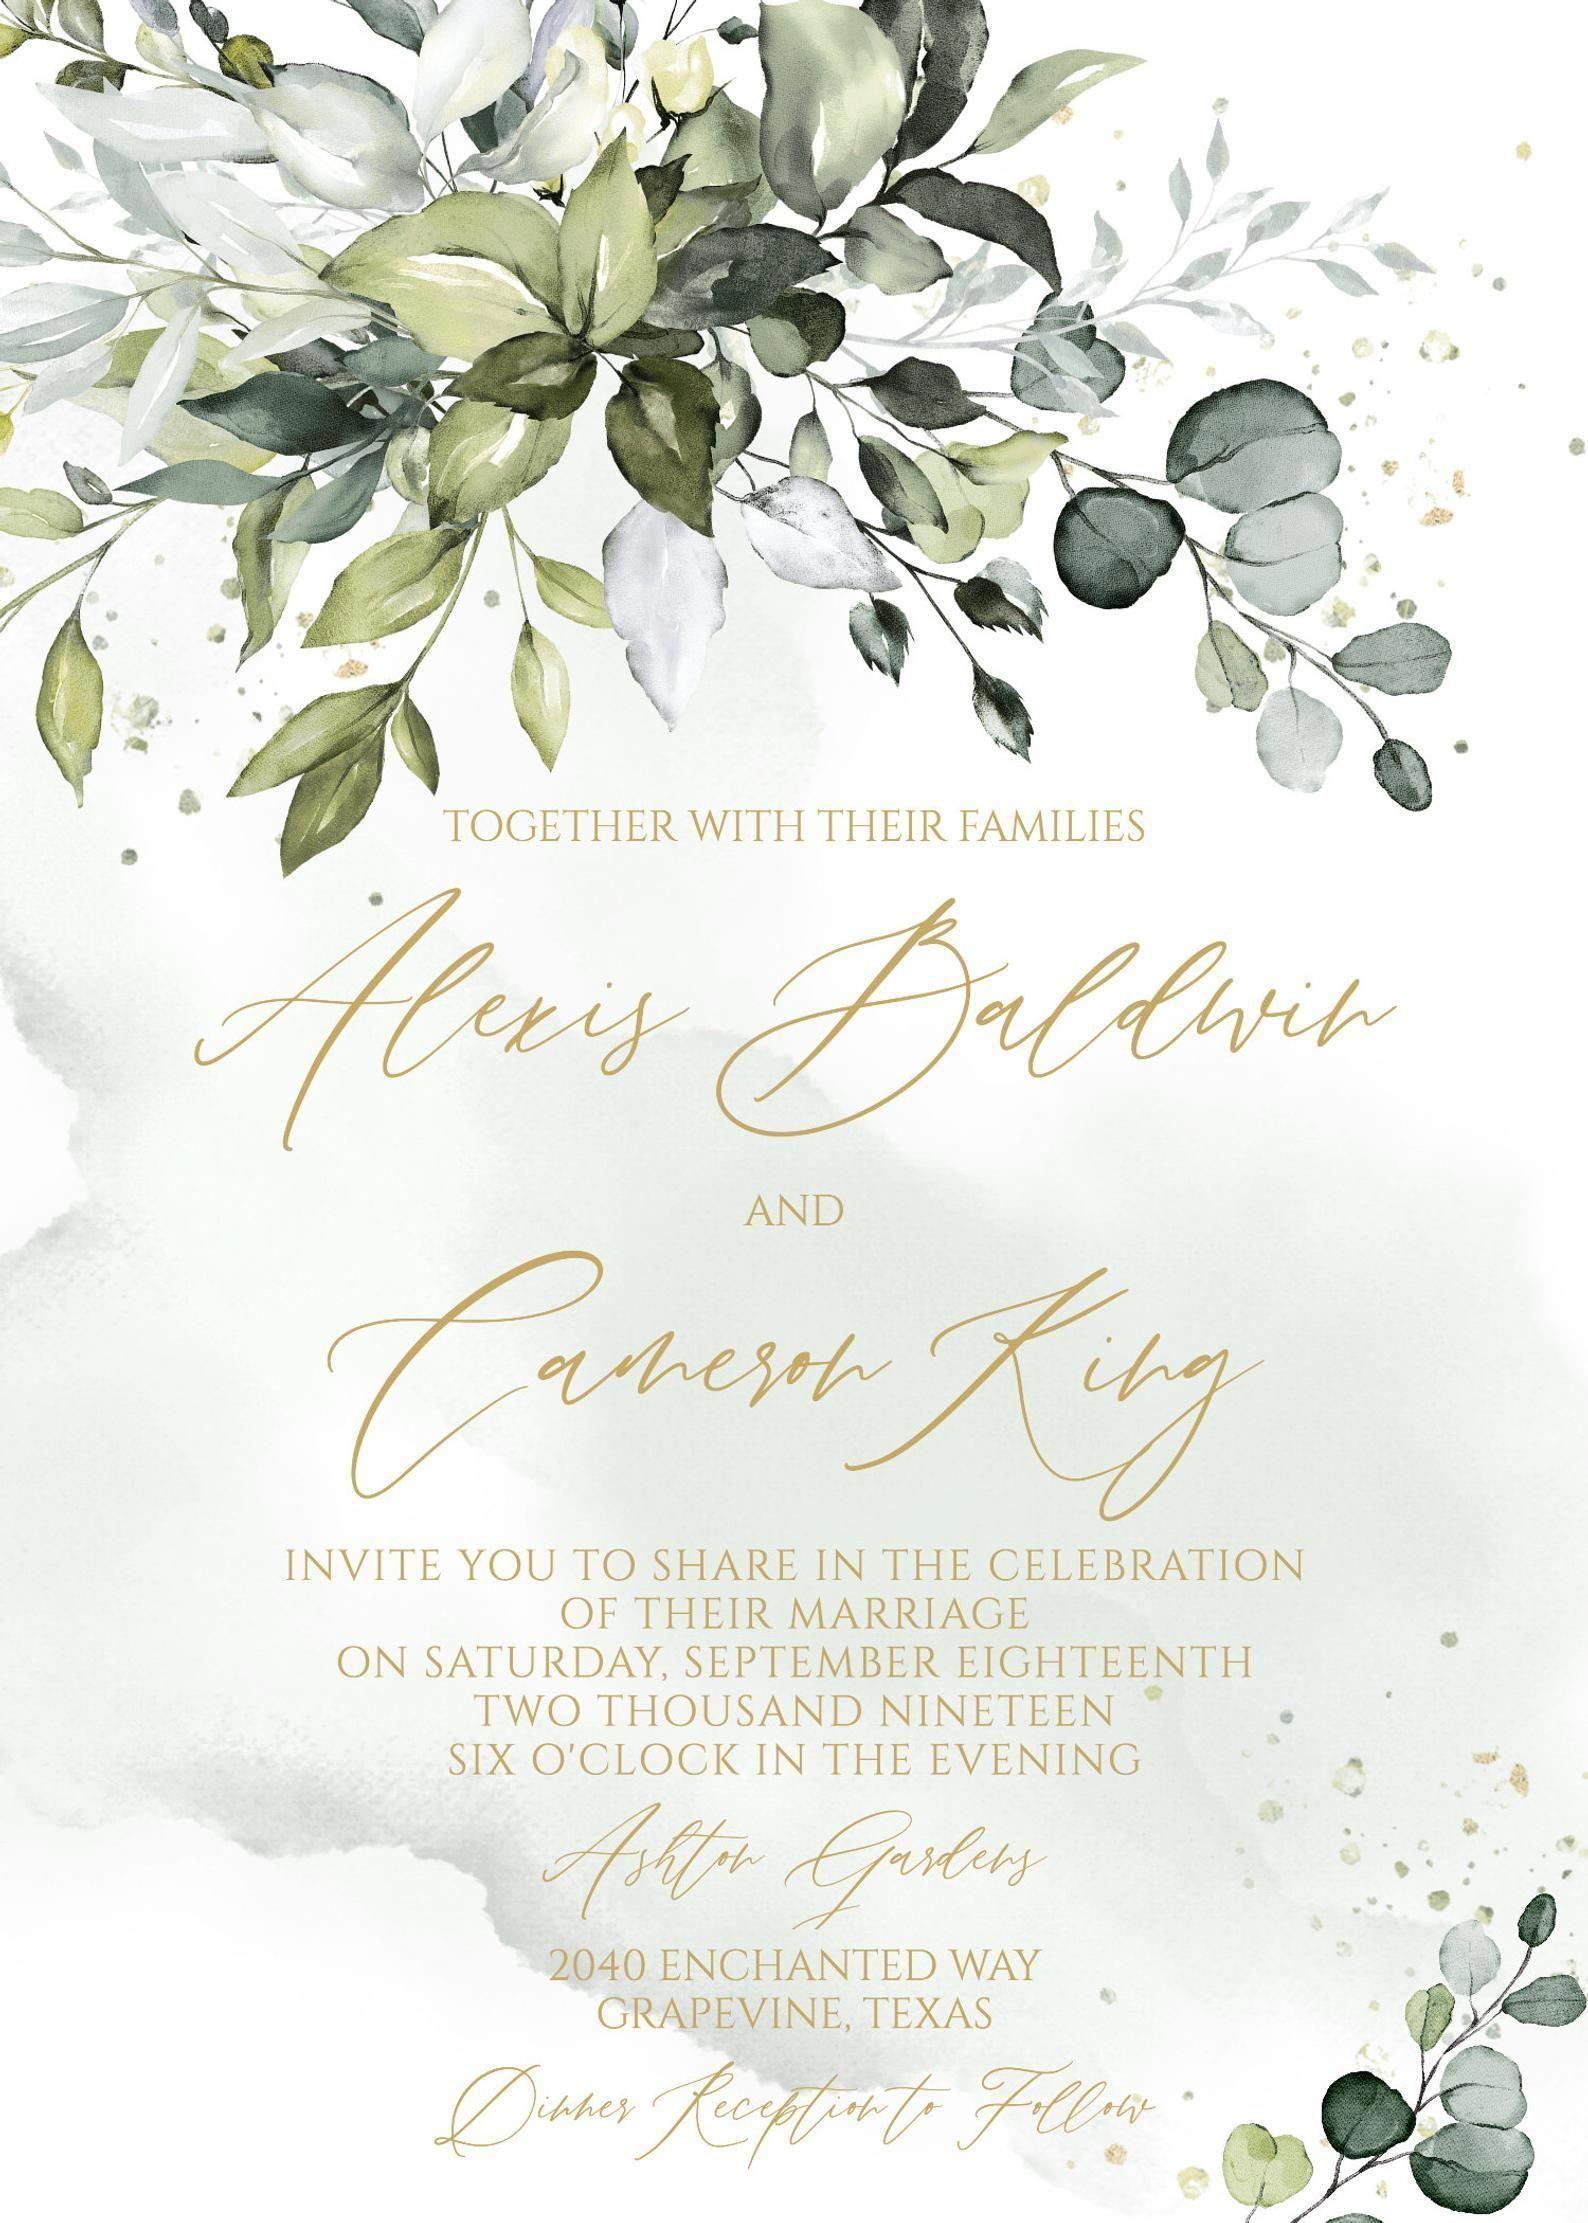 Greenery Wedding Invitation Template Printable Succulent Gold Etsy In 2020 Wedding Invitations Boho Cheap Wedding Invitations Wedding Invitation Templates